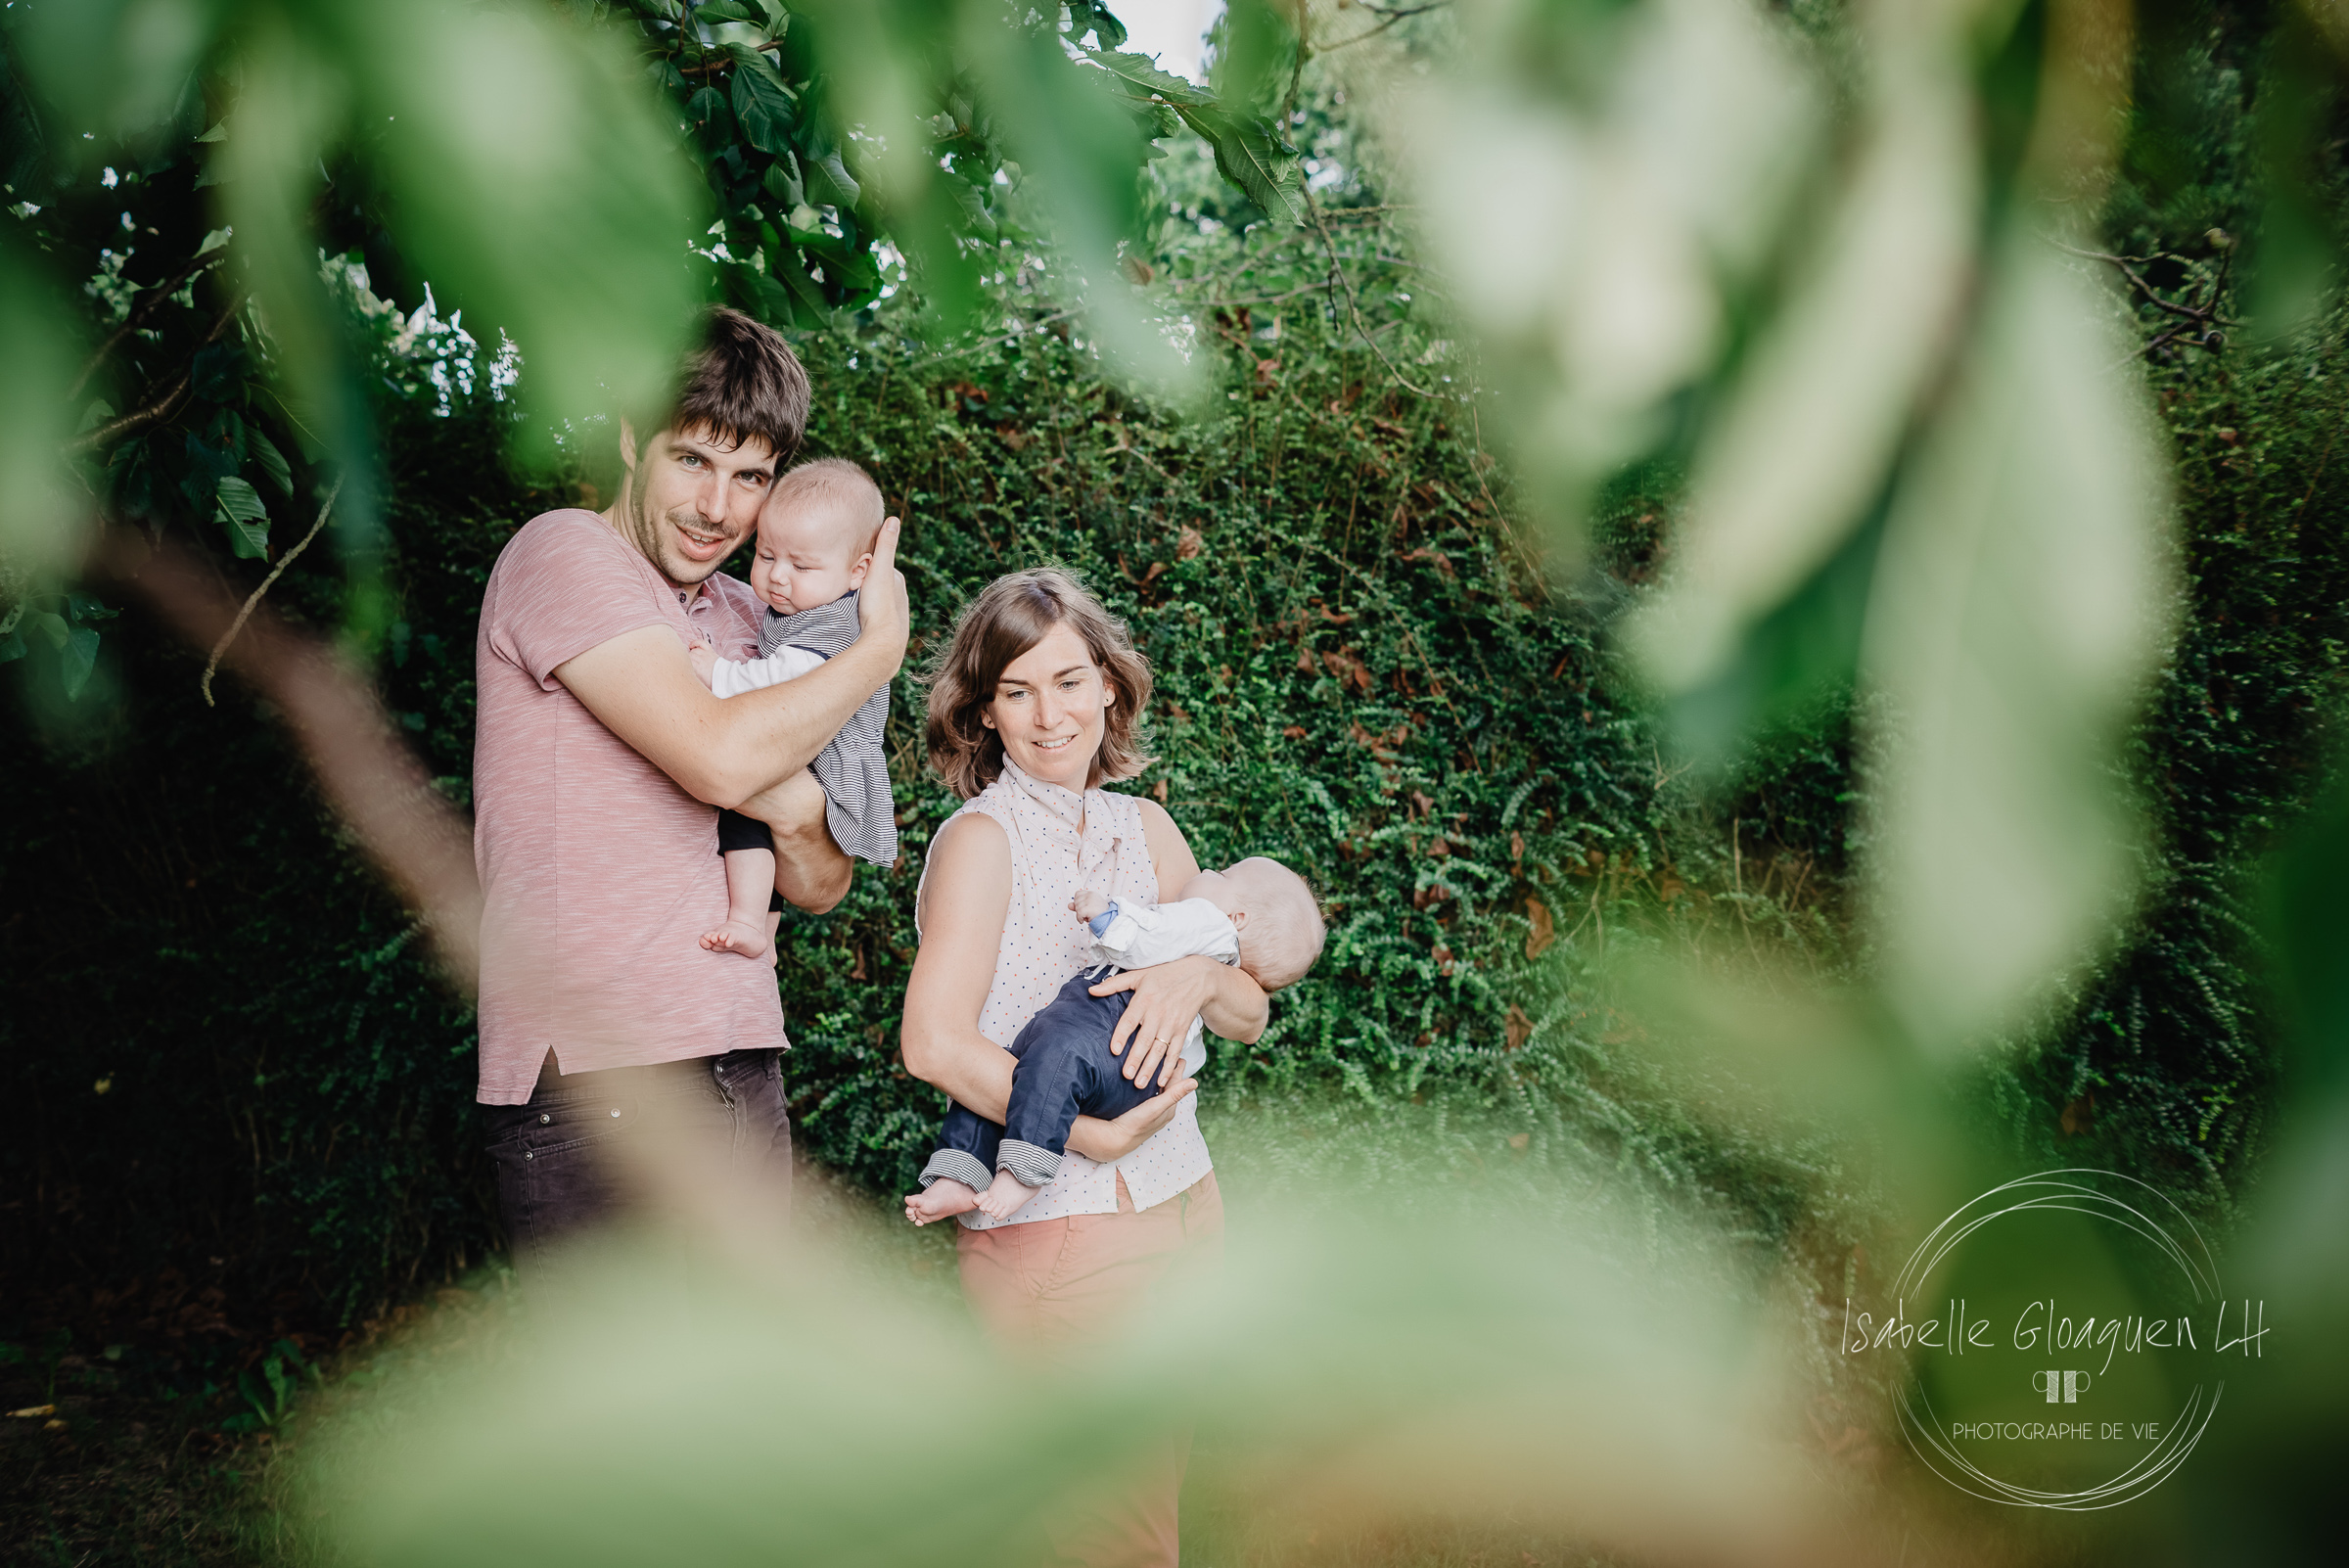 00018-PhotographeDeVie-Gloaguen-Tilda&Armel